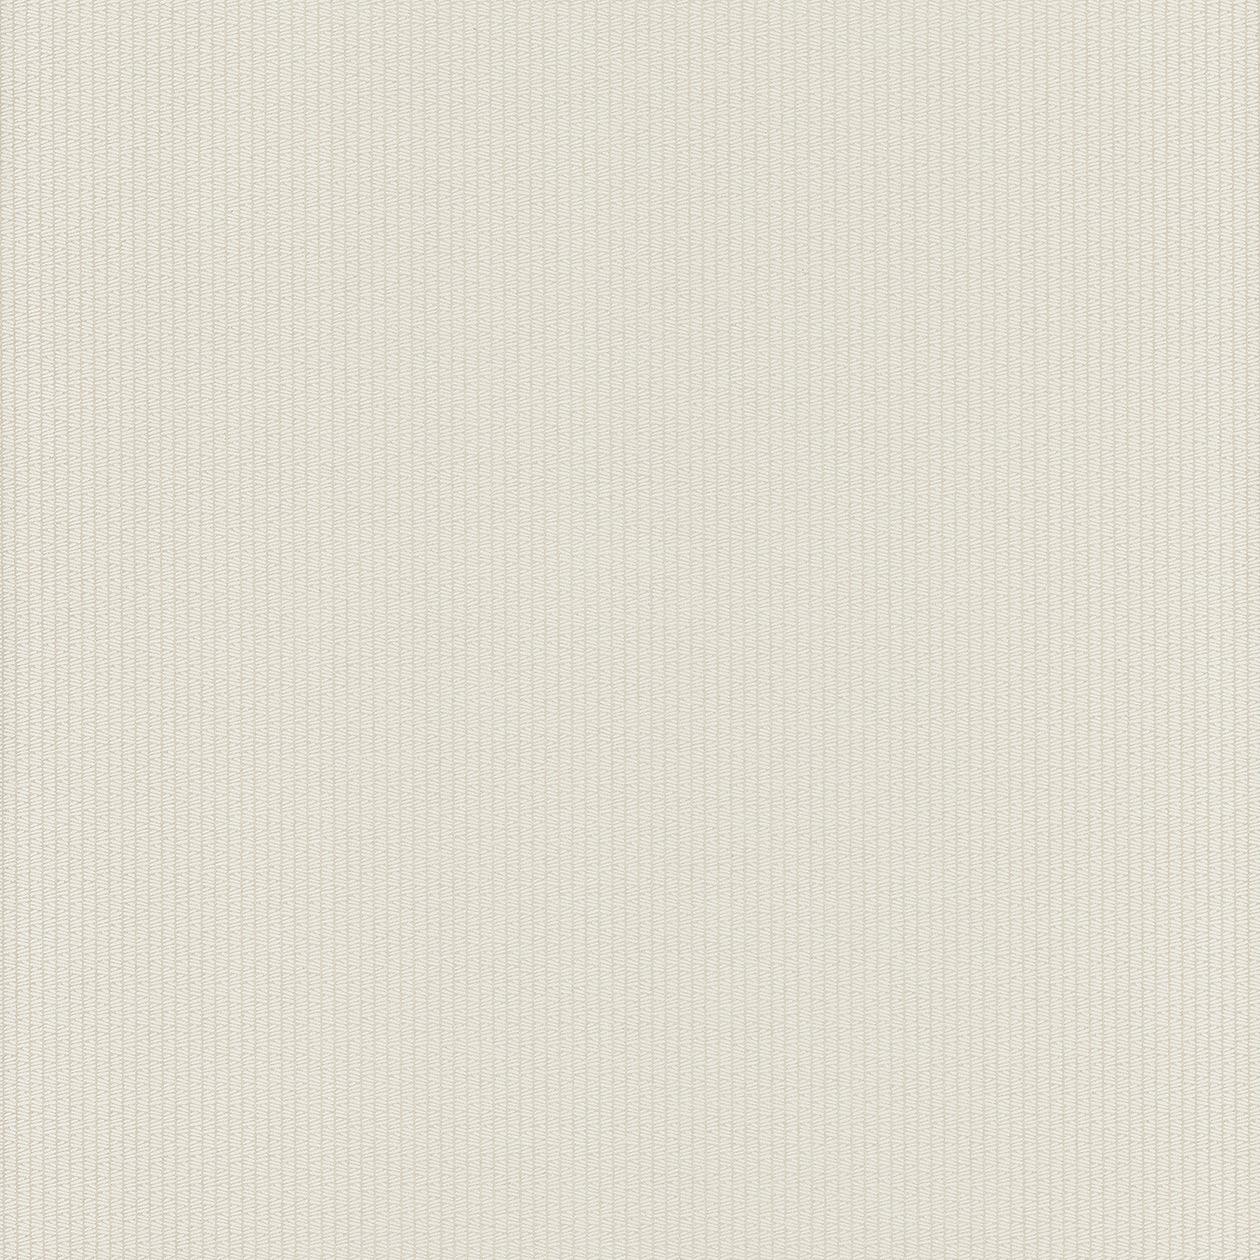 Французские обои Caselio,  коллекция Trio, артикулTIO68010006